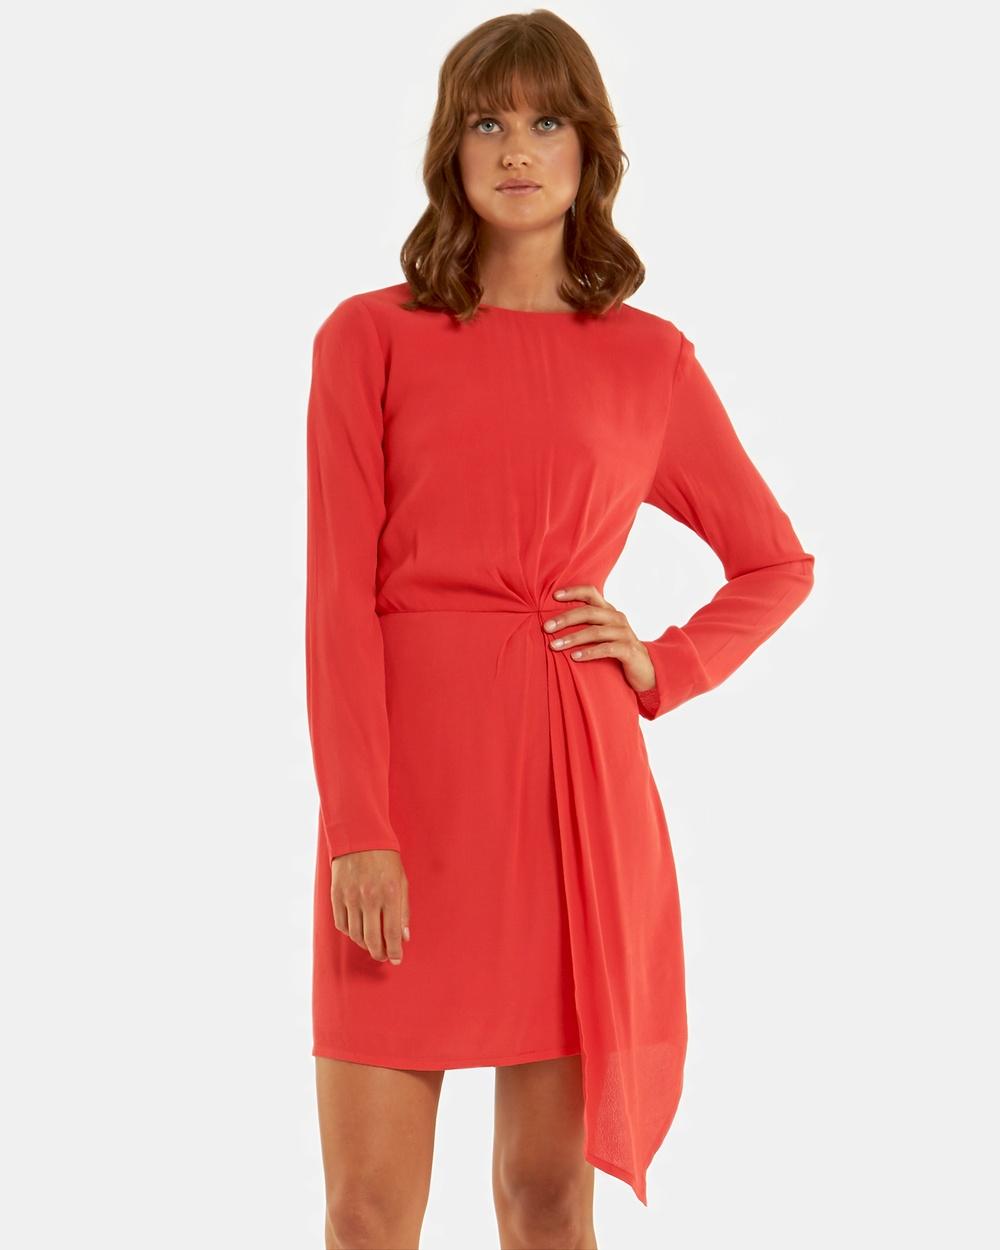 Amelius Celeste Dress Dresses Red Celeste Dress